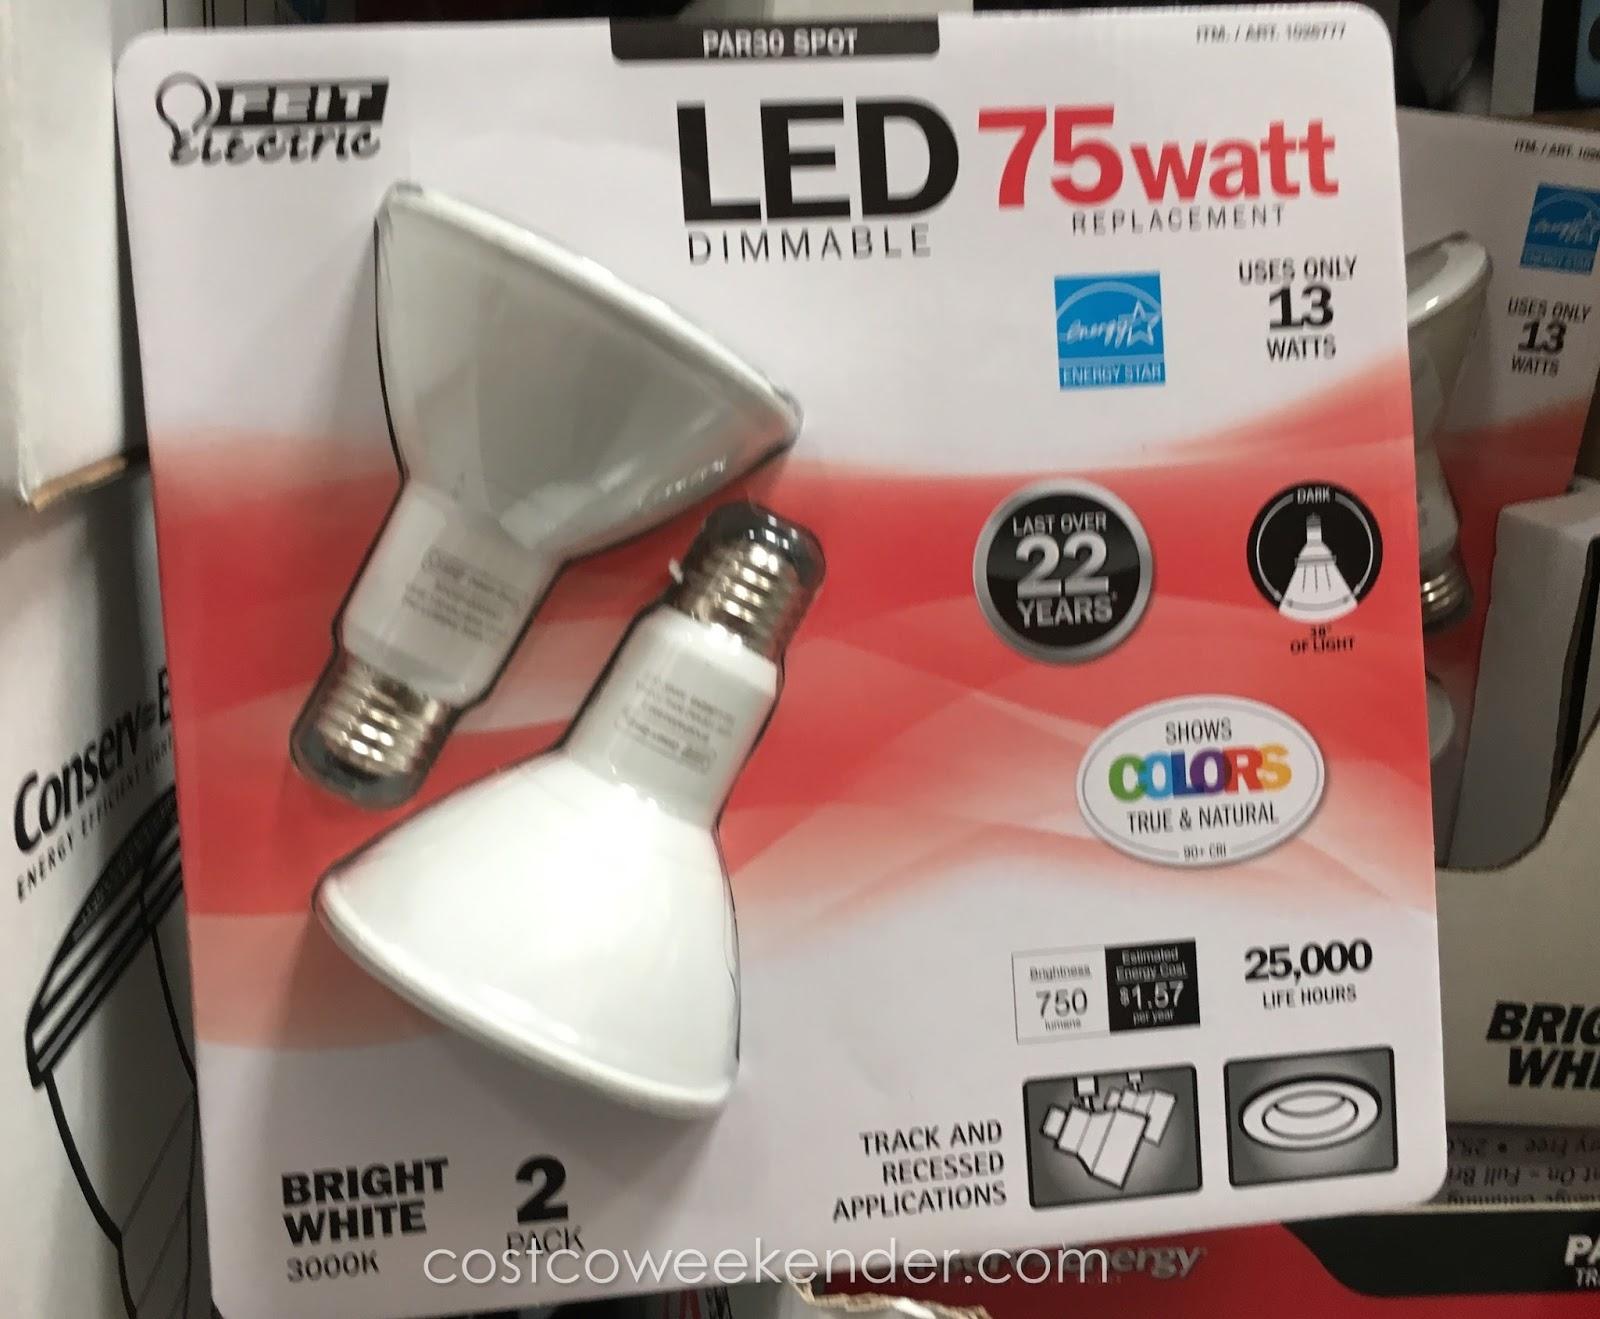 feit electric par30 spot led dimmable 75 watt bulb 2 pack. Black Bedroom Furniture Sets. Home Design Ideas